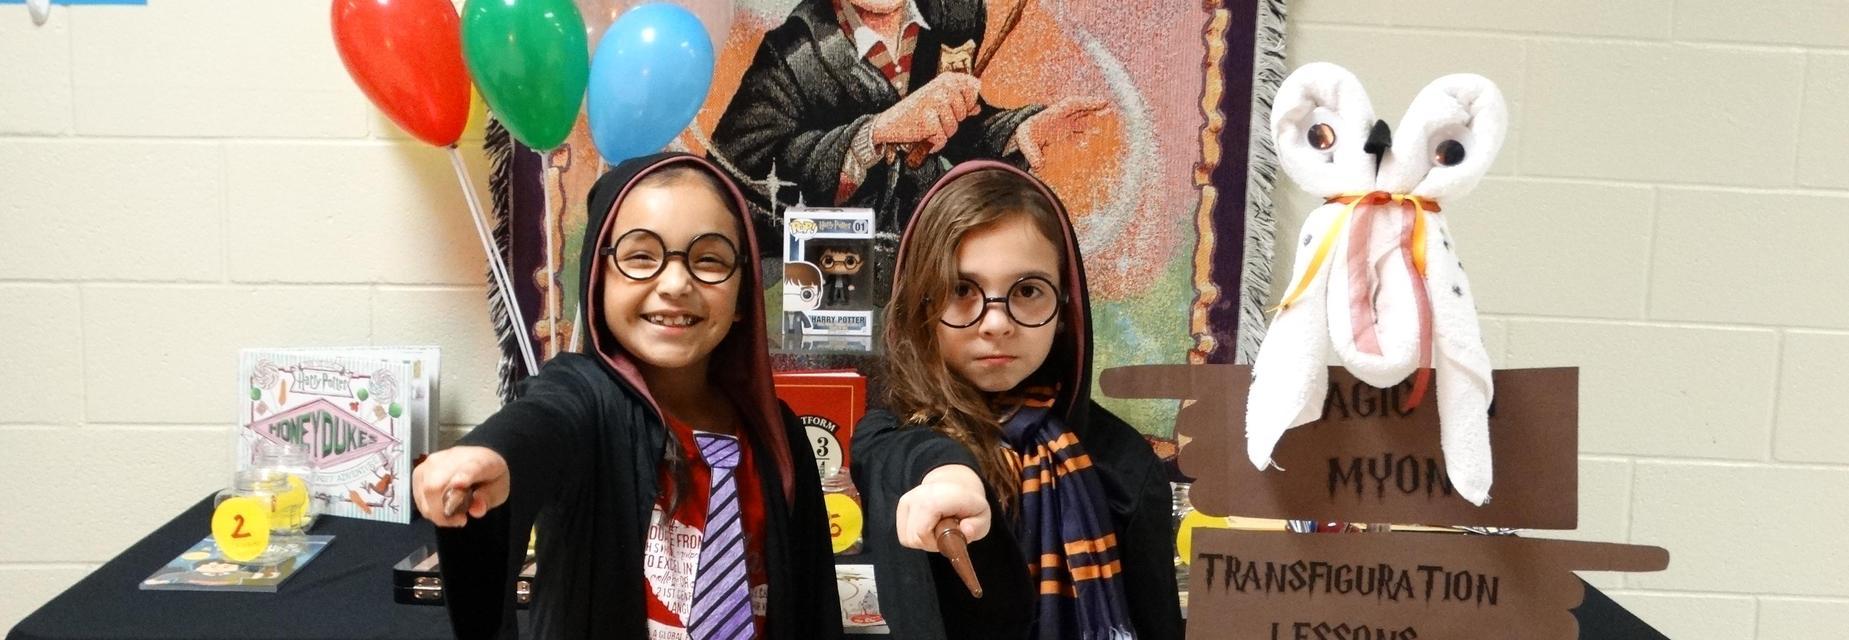 Hogwarts students at literacy night